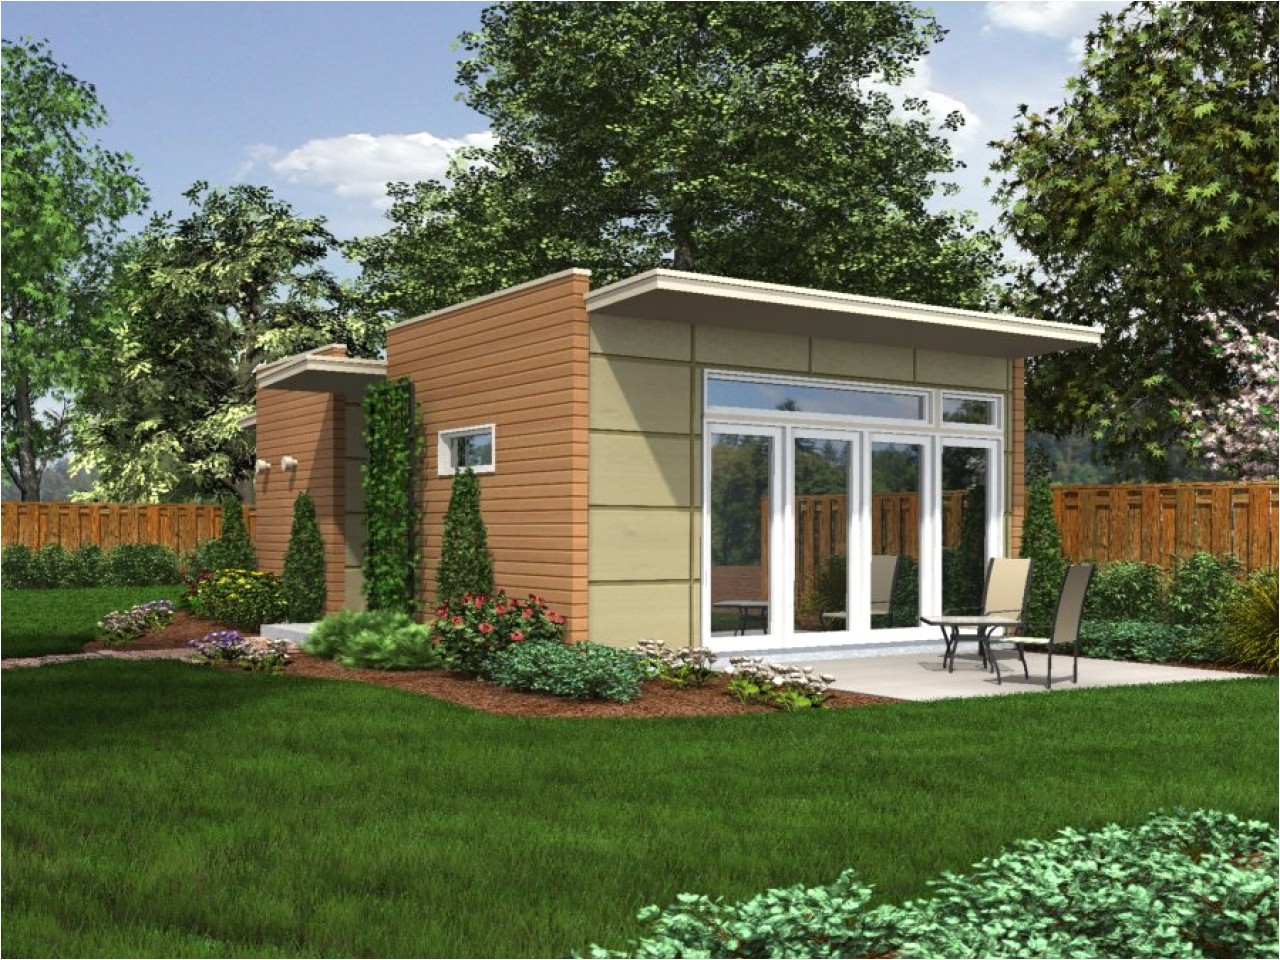 3070cc77dd8f06b8 small backyard buildings backyard cottage small houses